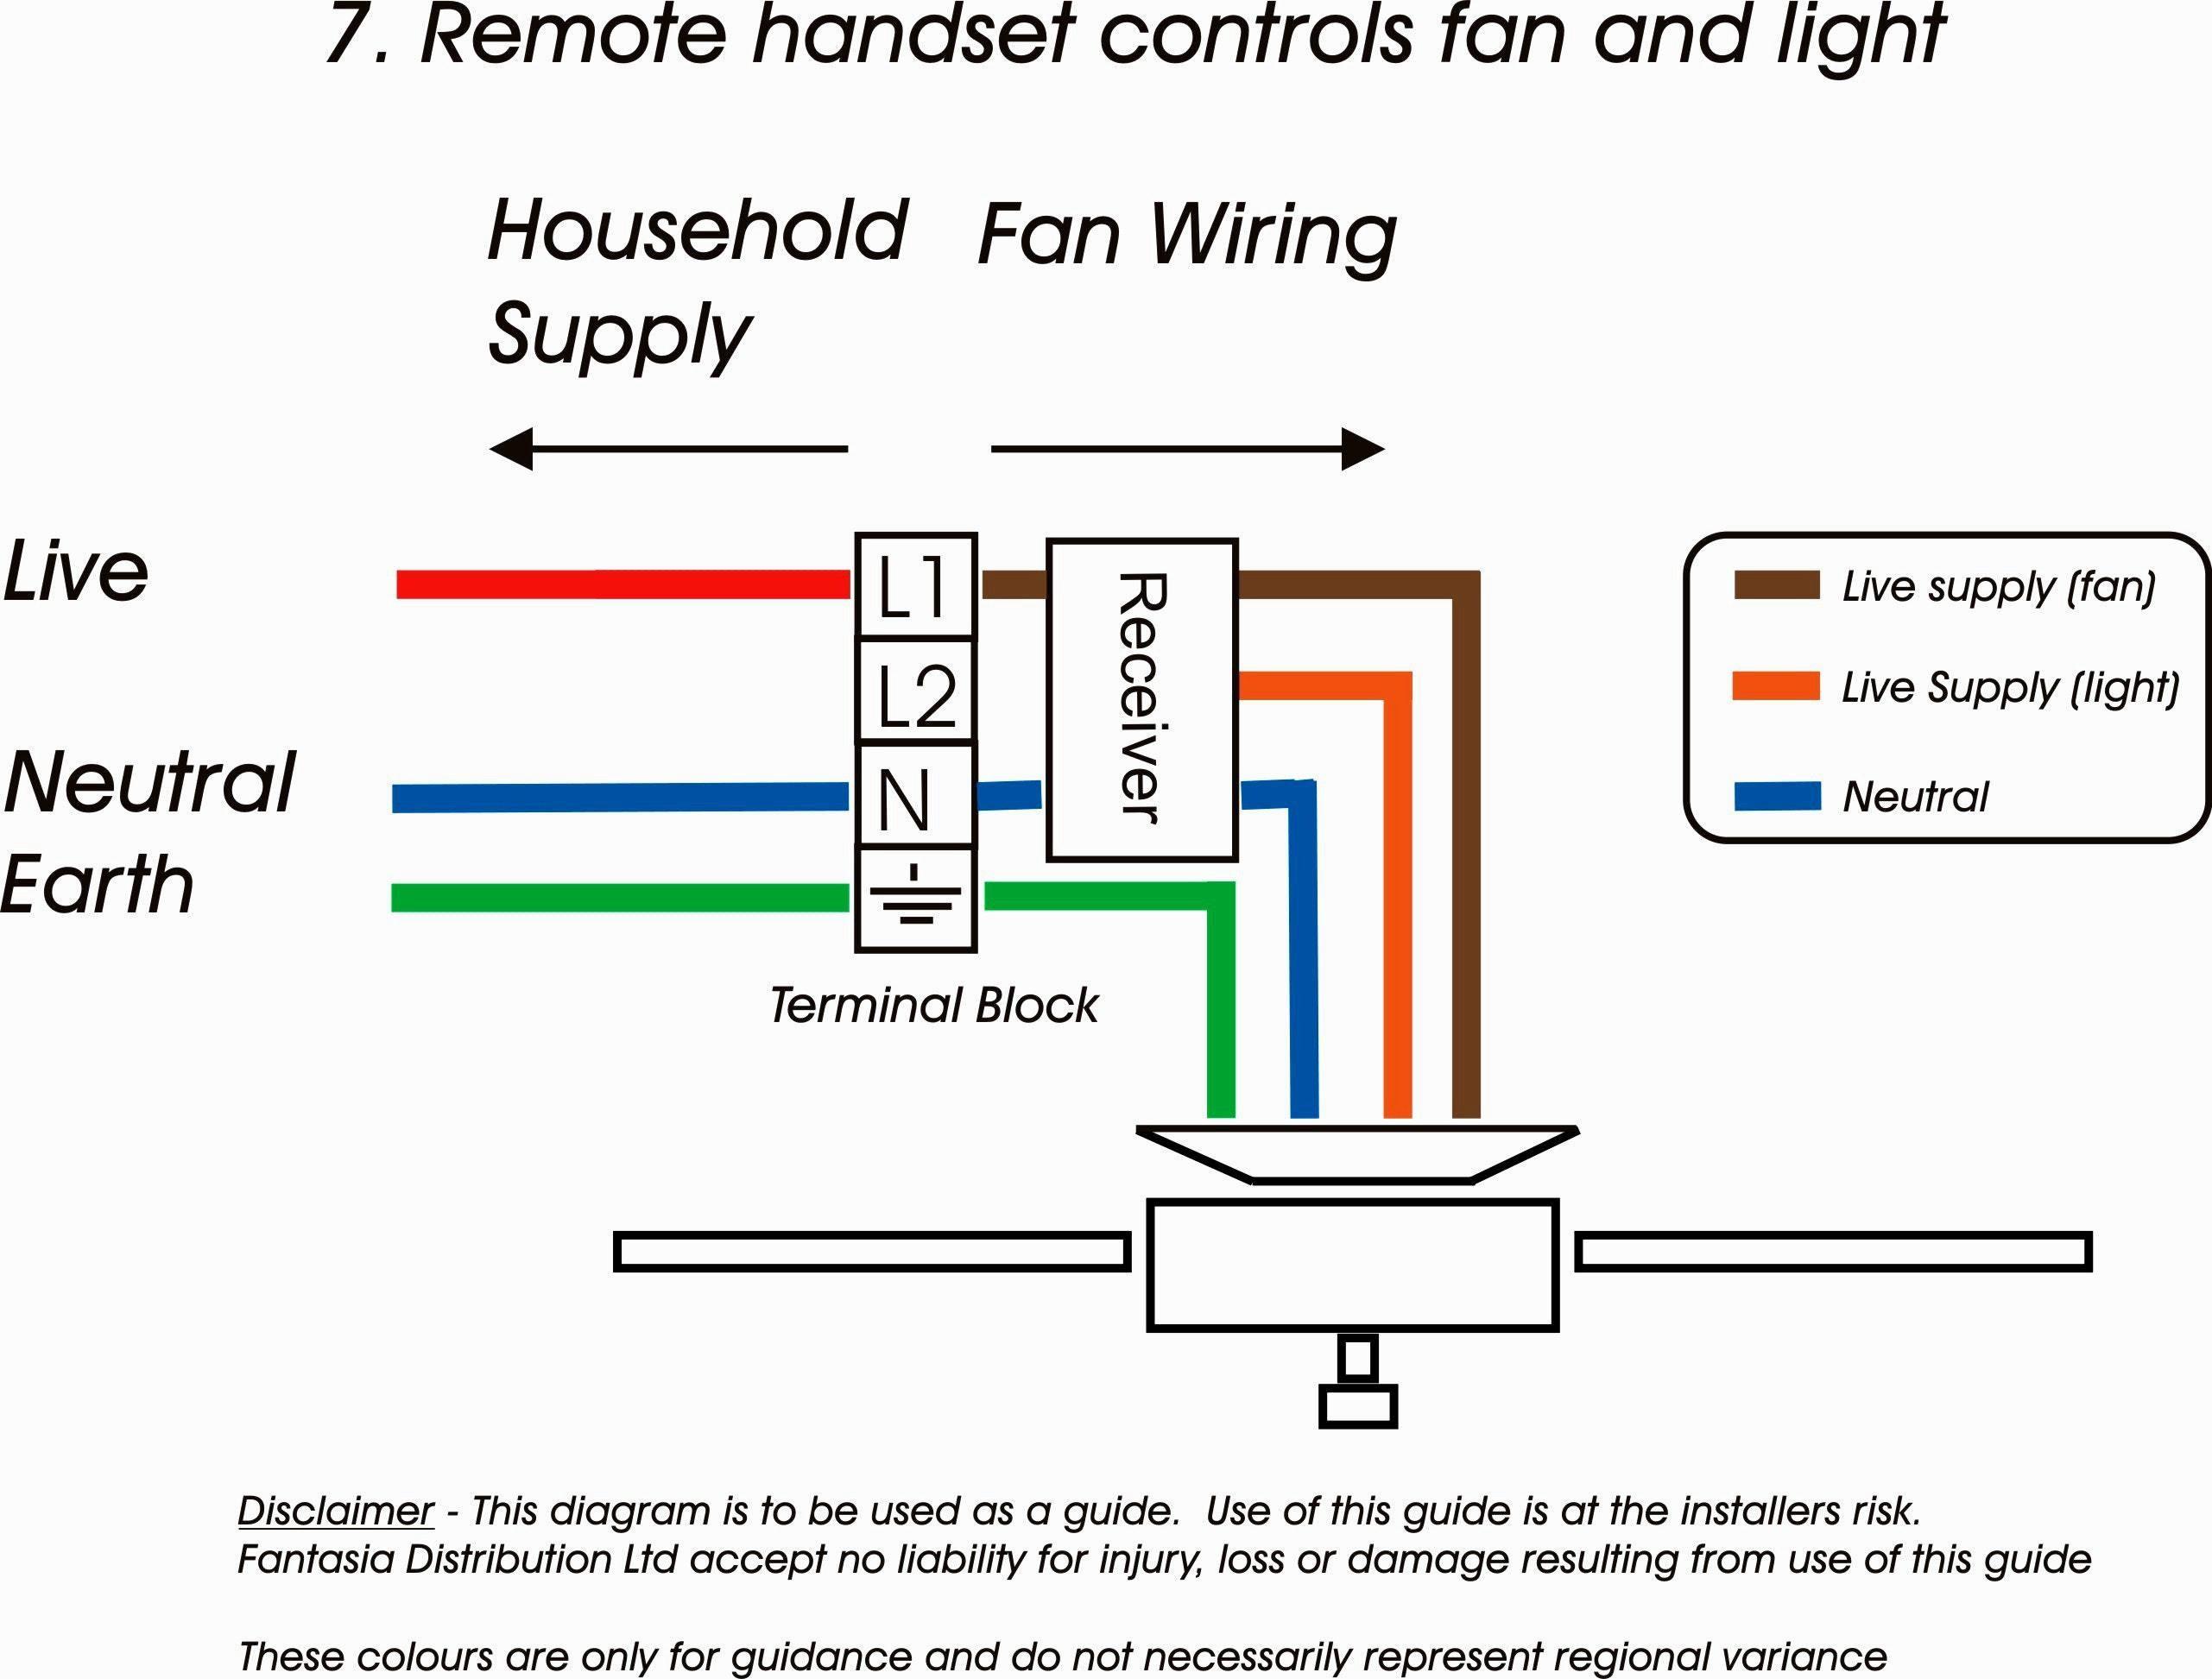 3 Way Dimmer Switch Wiring Diagram Leviton 3 Way Dimmer Switch Wiring Diagram Samsung Oven and Three Of 3 Way Dimmer Switch Wiring Diagram